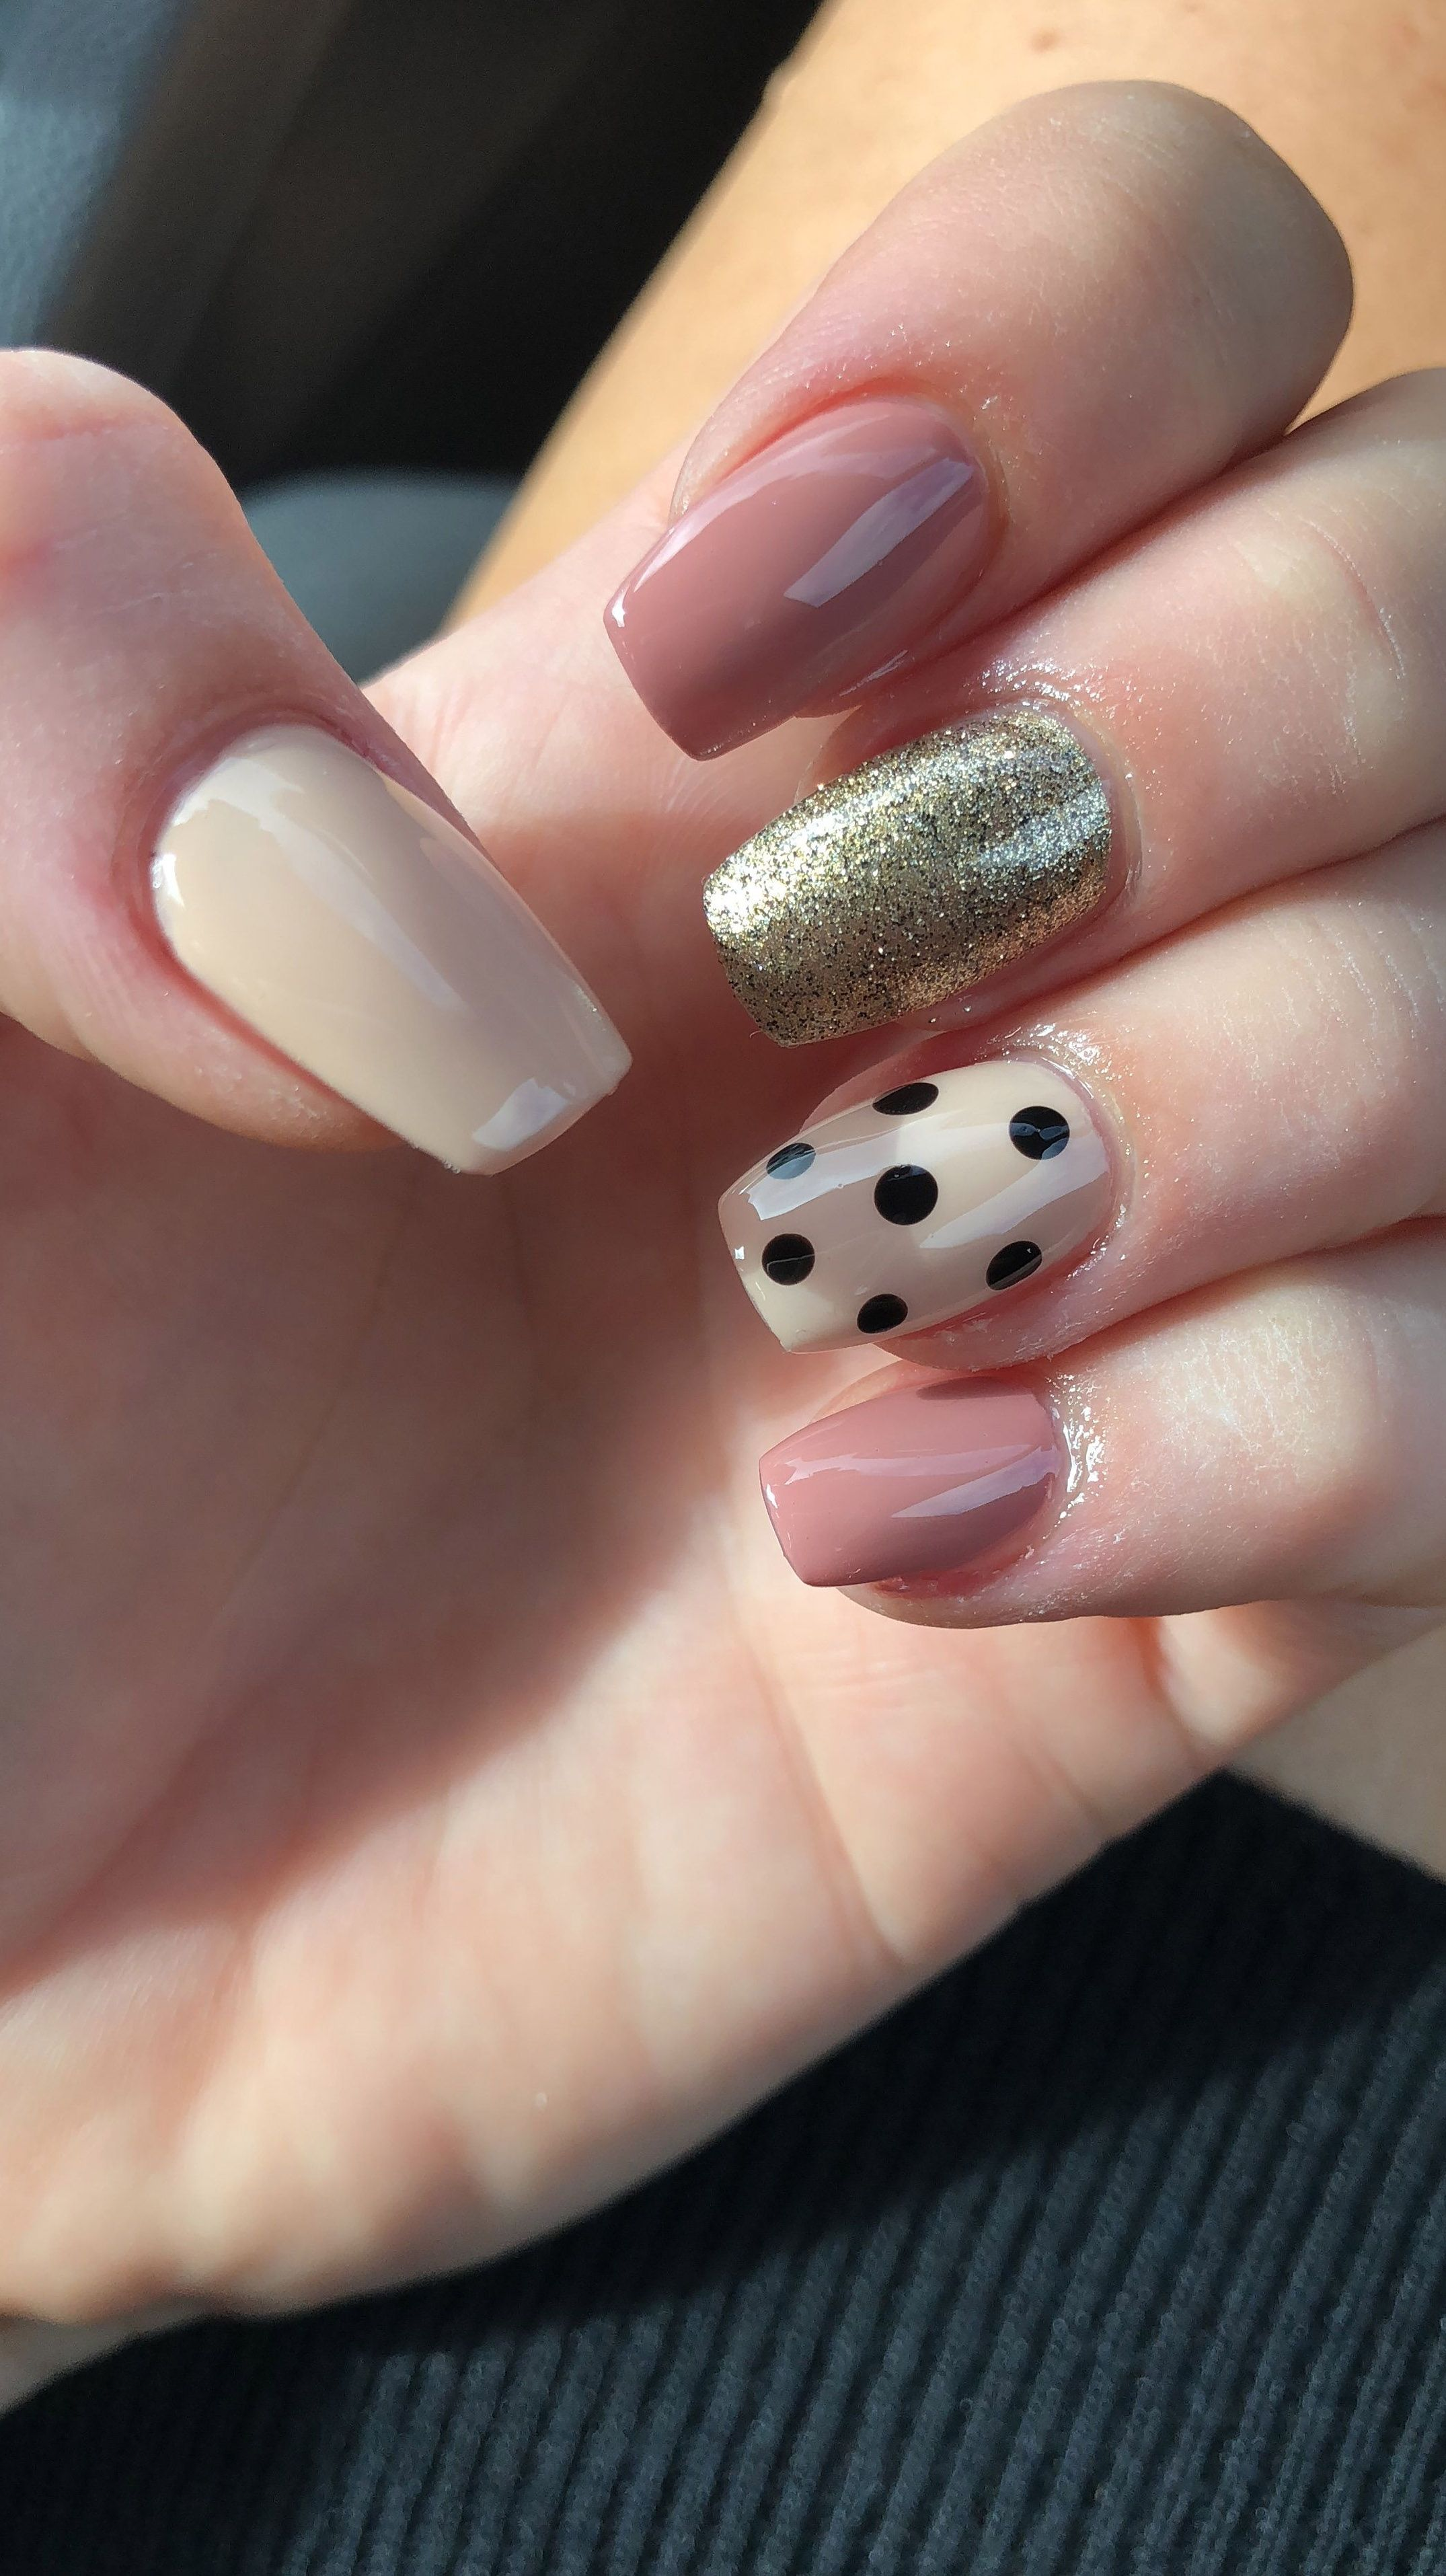 Polka Dot Nails Nail Art 2019 Paznokcie Zelowe Paznokcie Uroda